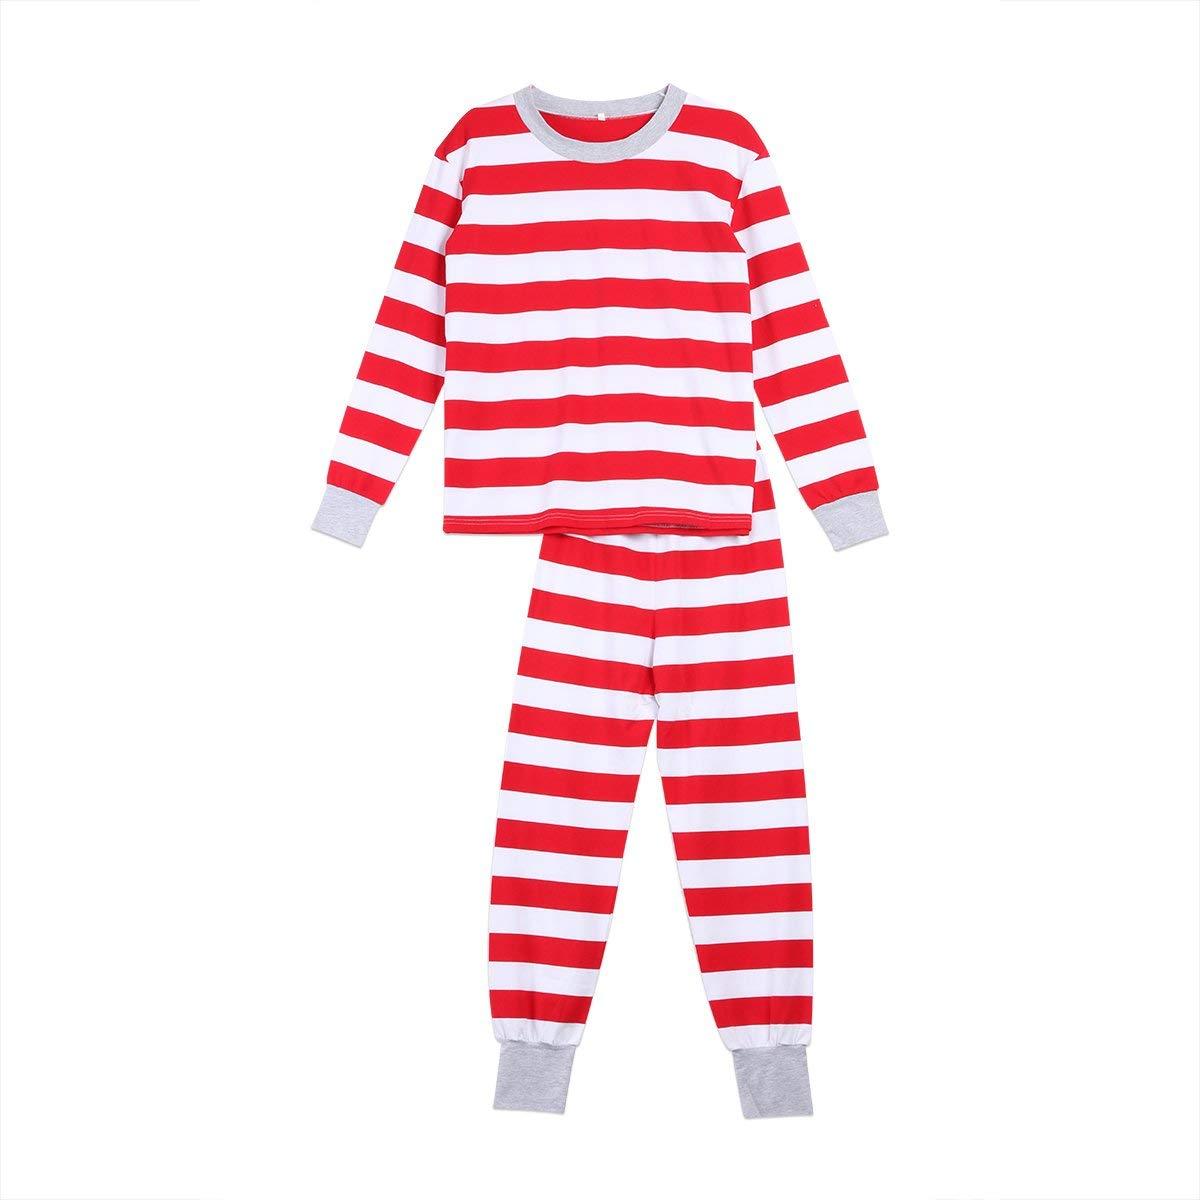 d1bd765c09 Tianve Christmas Pajamas - Family Matching Christmas Striped Pajamas Sets  Dad Mom Kids Baby Sleepwear Outfits